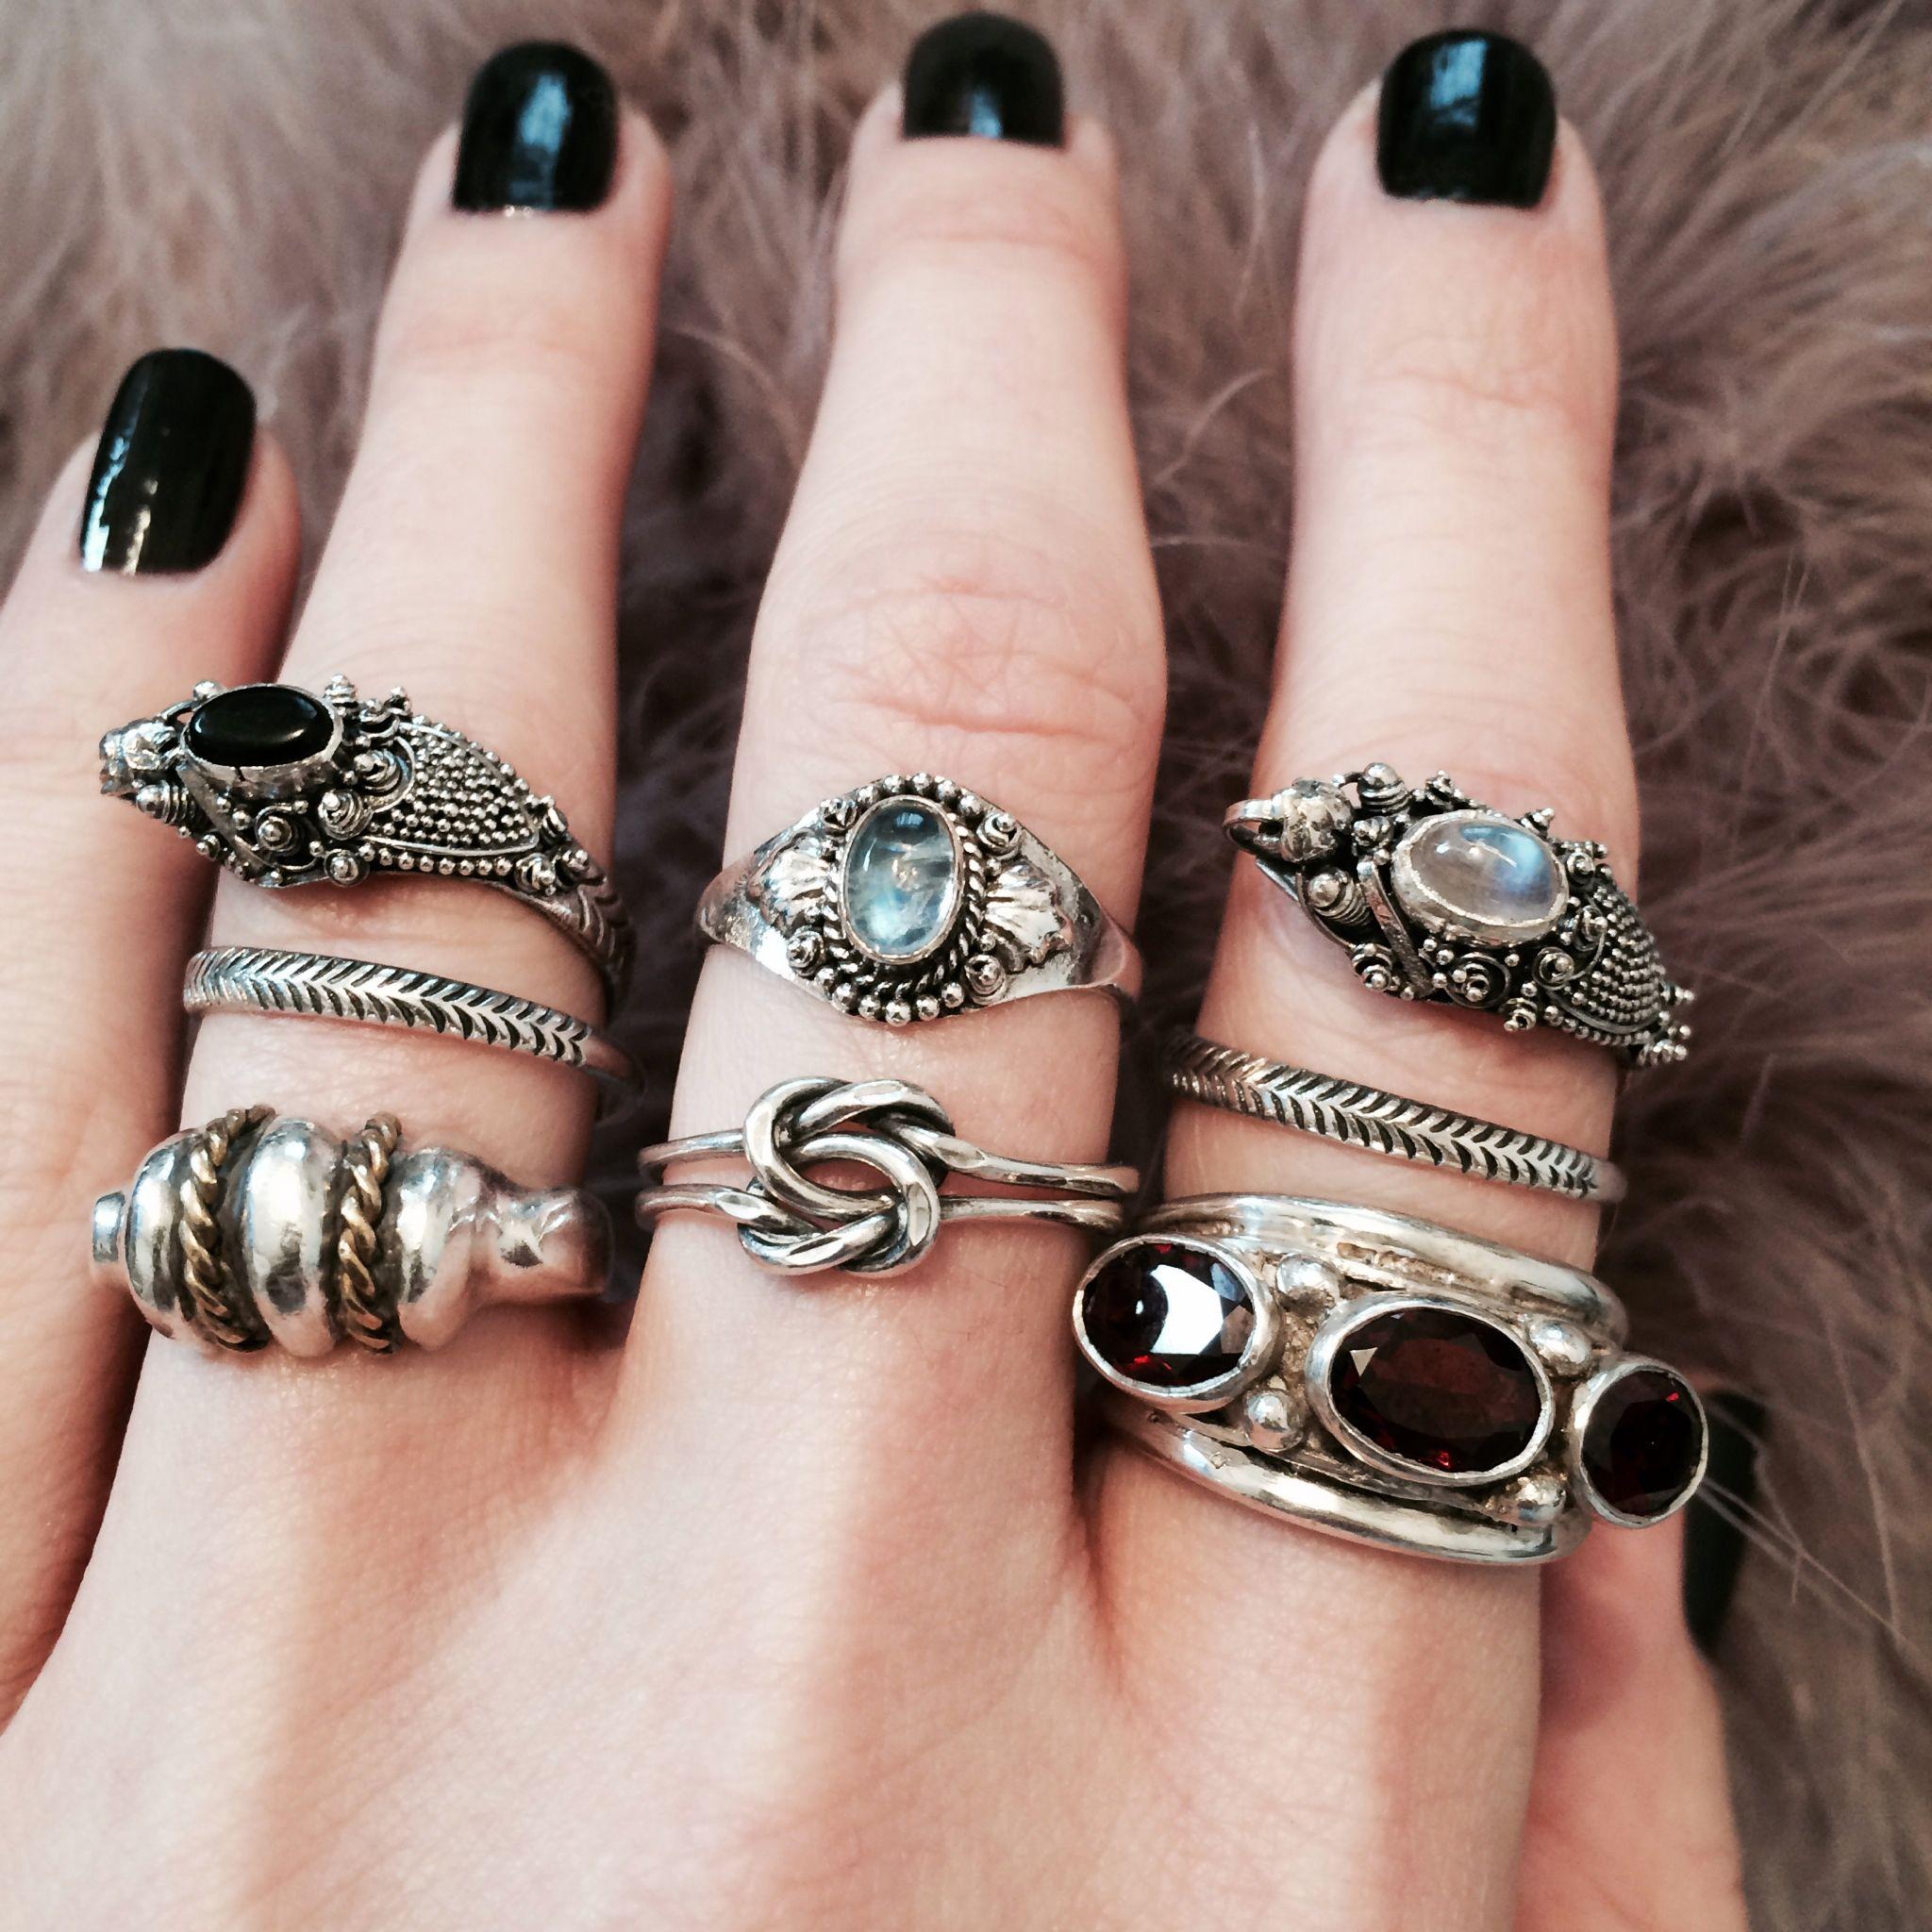 Cool Bohemian Rings Casual Cosplay Grunge Fashion Jewelry